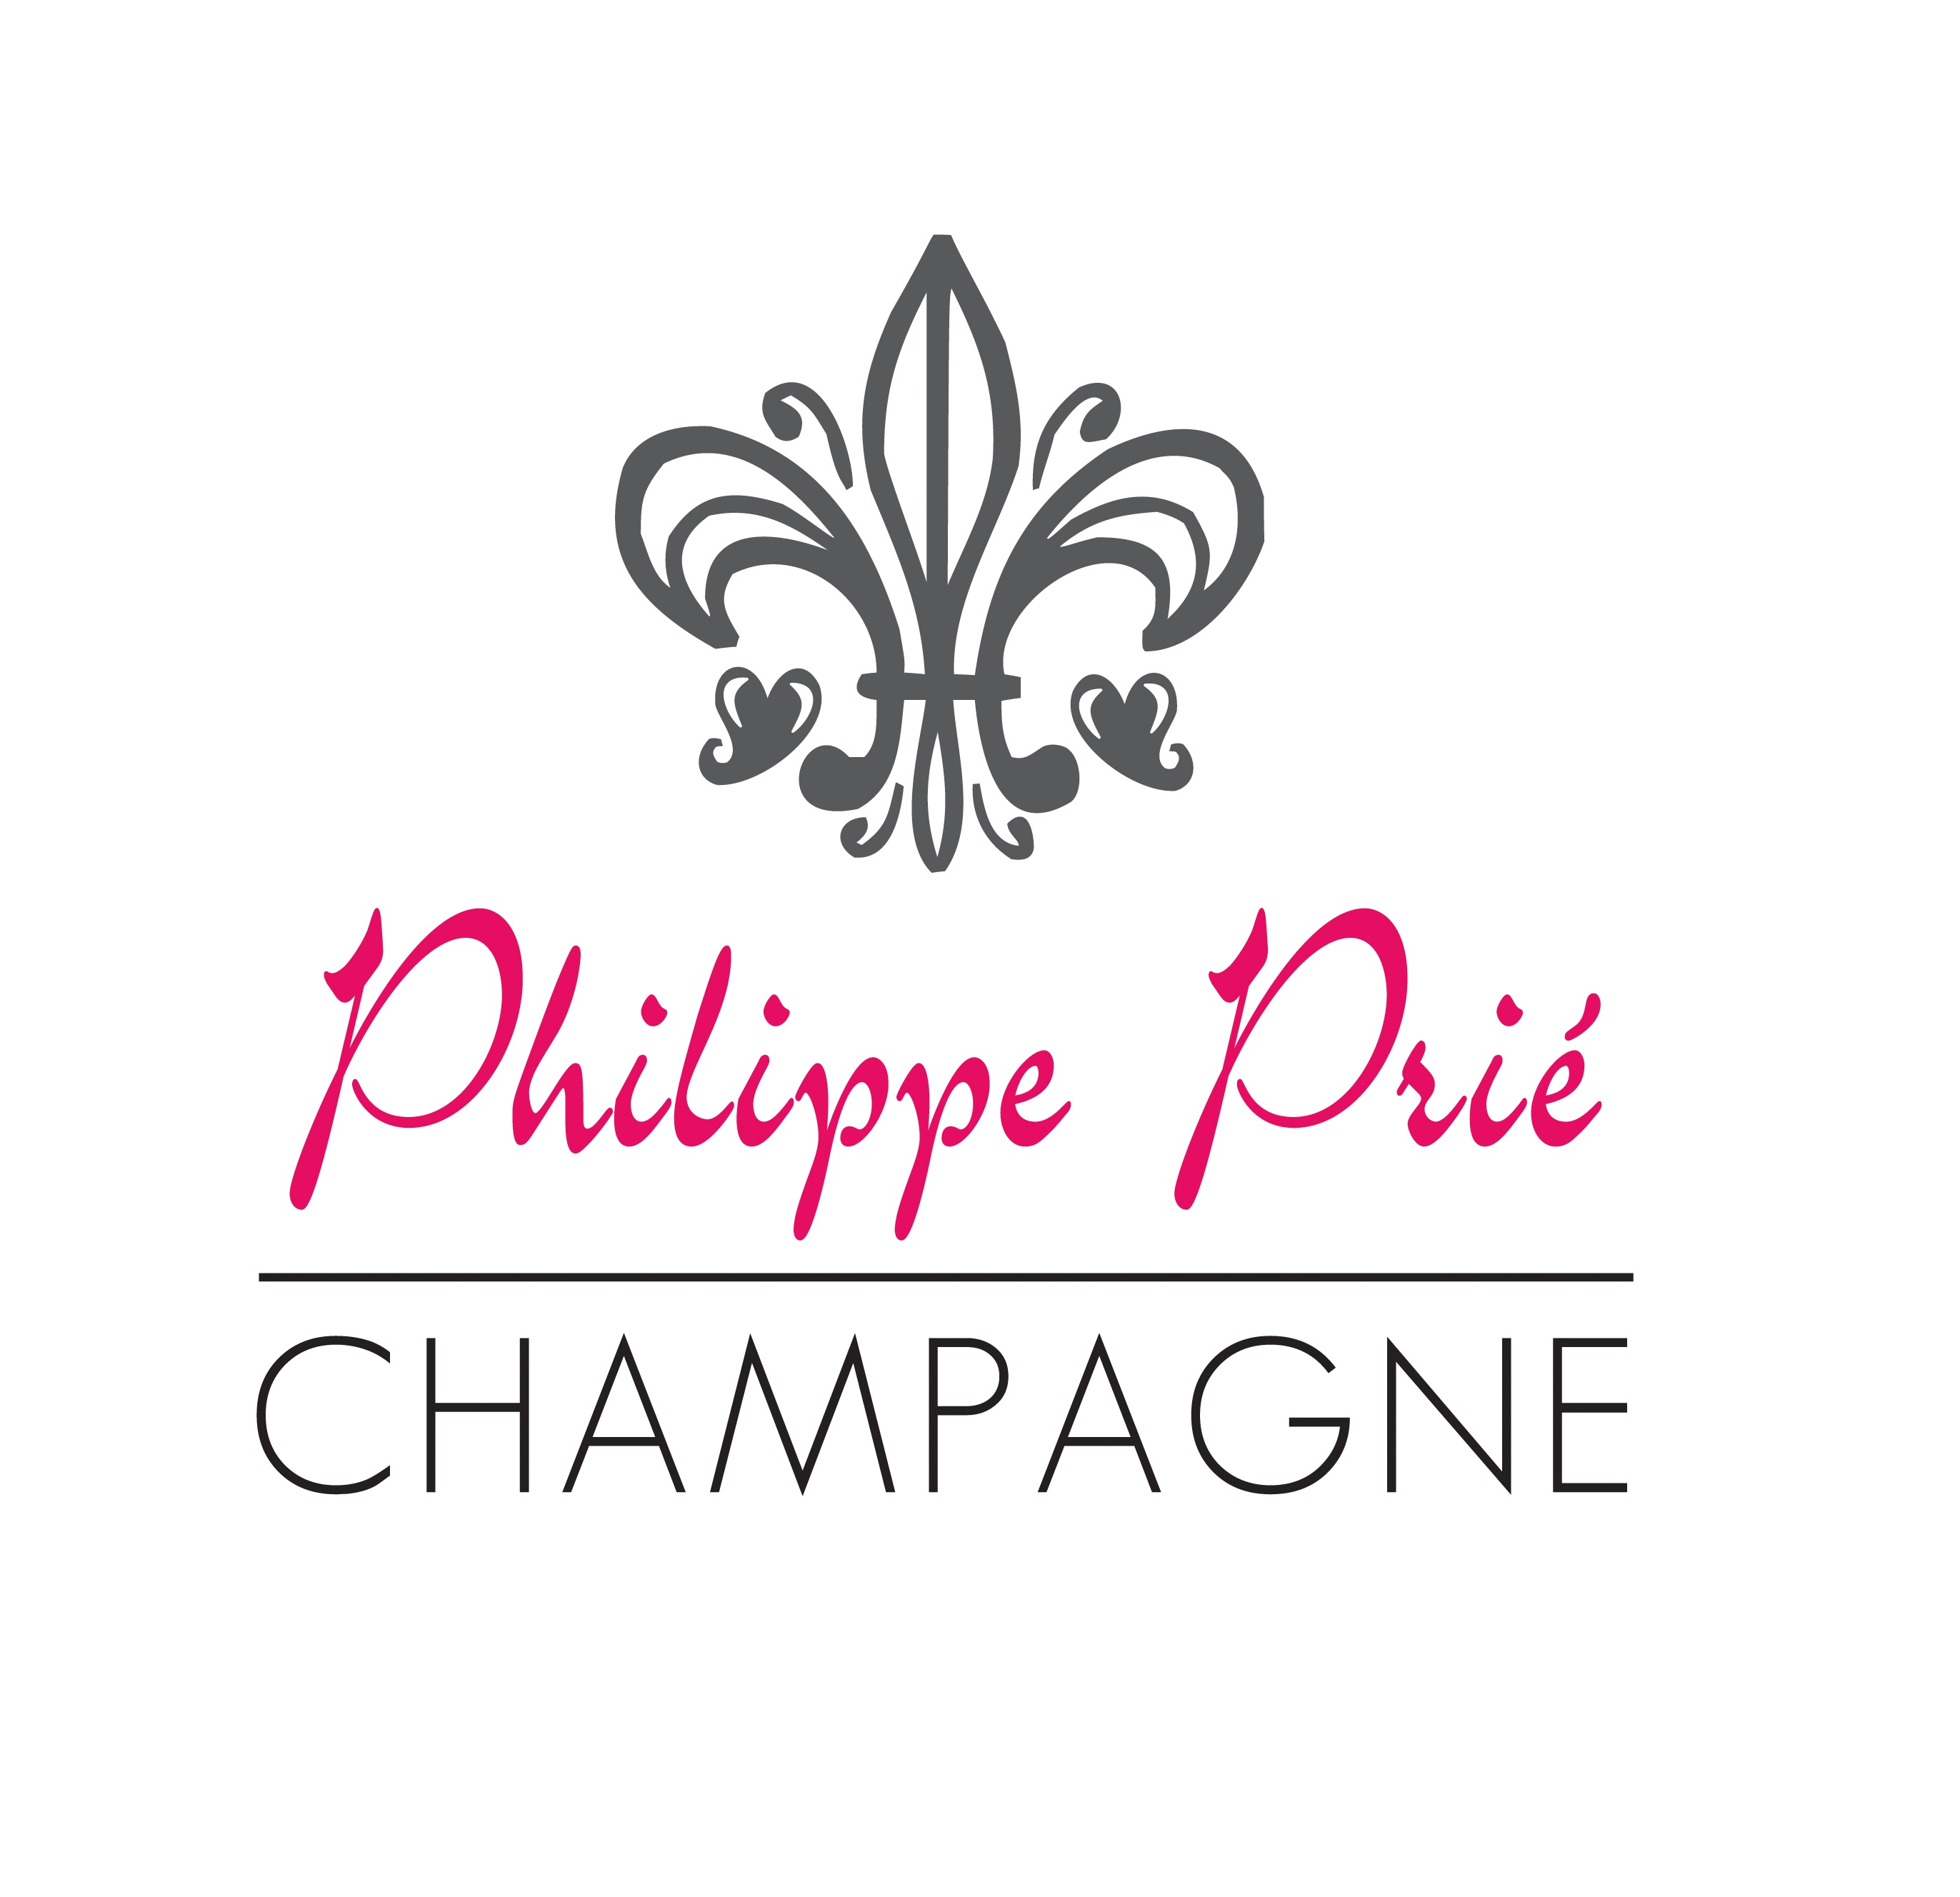 Champagne Philippe Prie